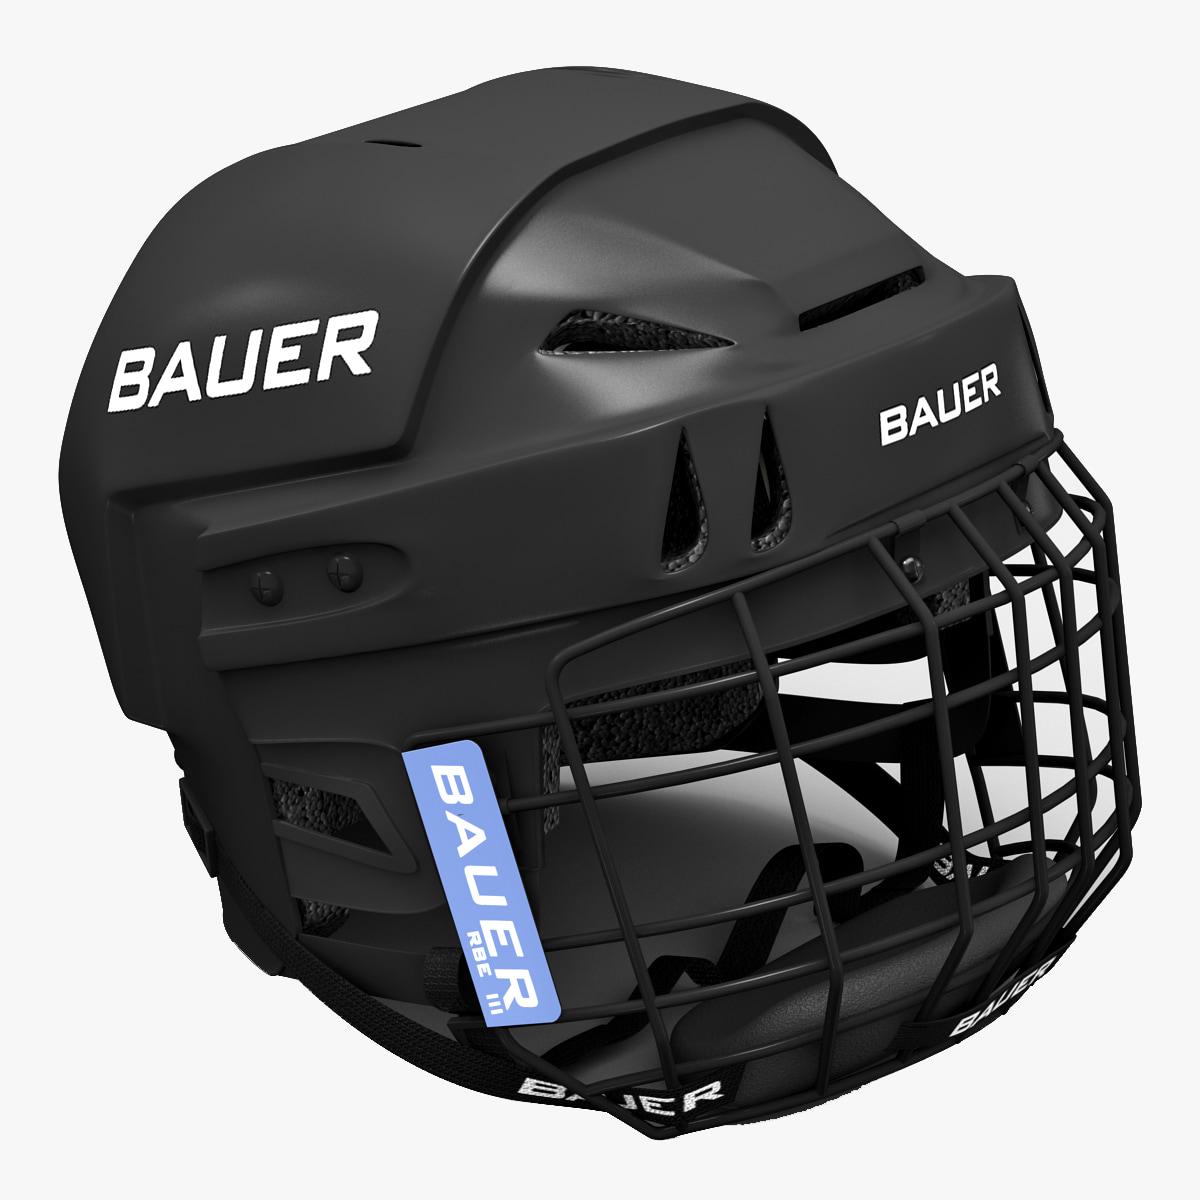 Hockey_Helmet_Bauer_M104_Combo_000.jpg